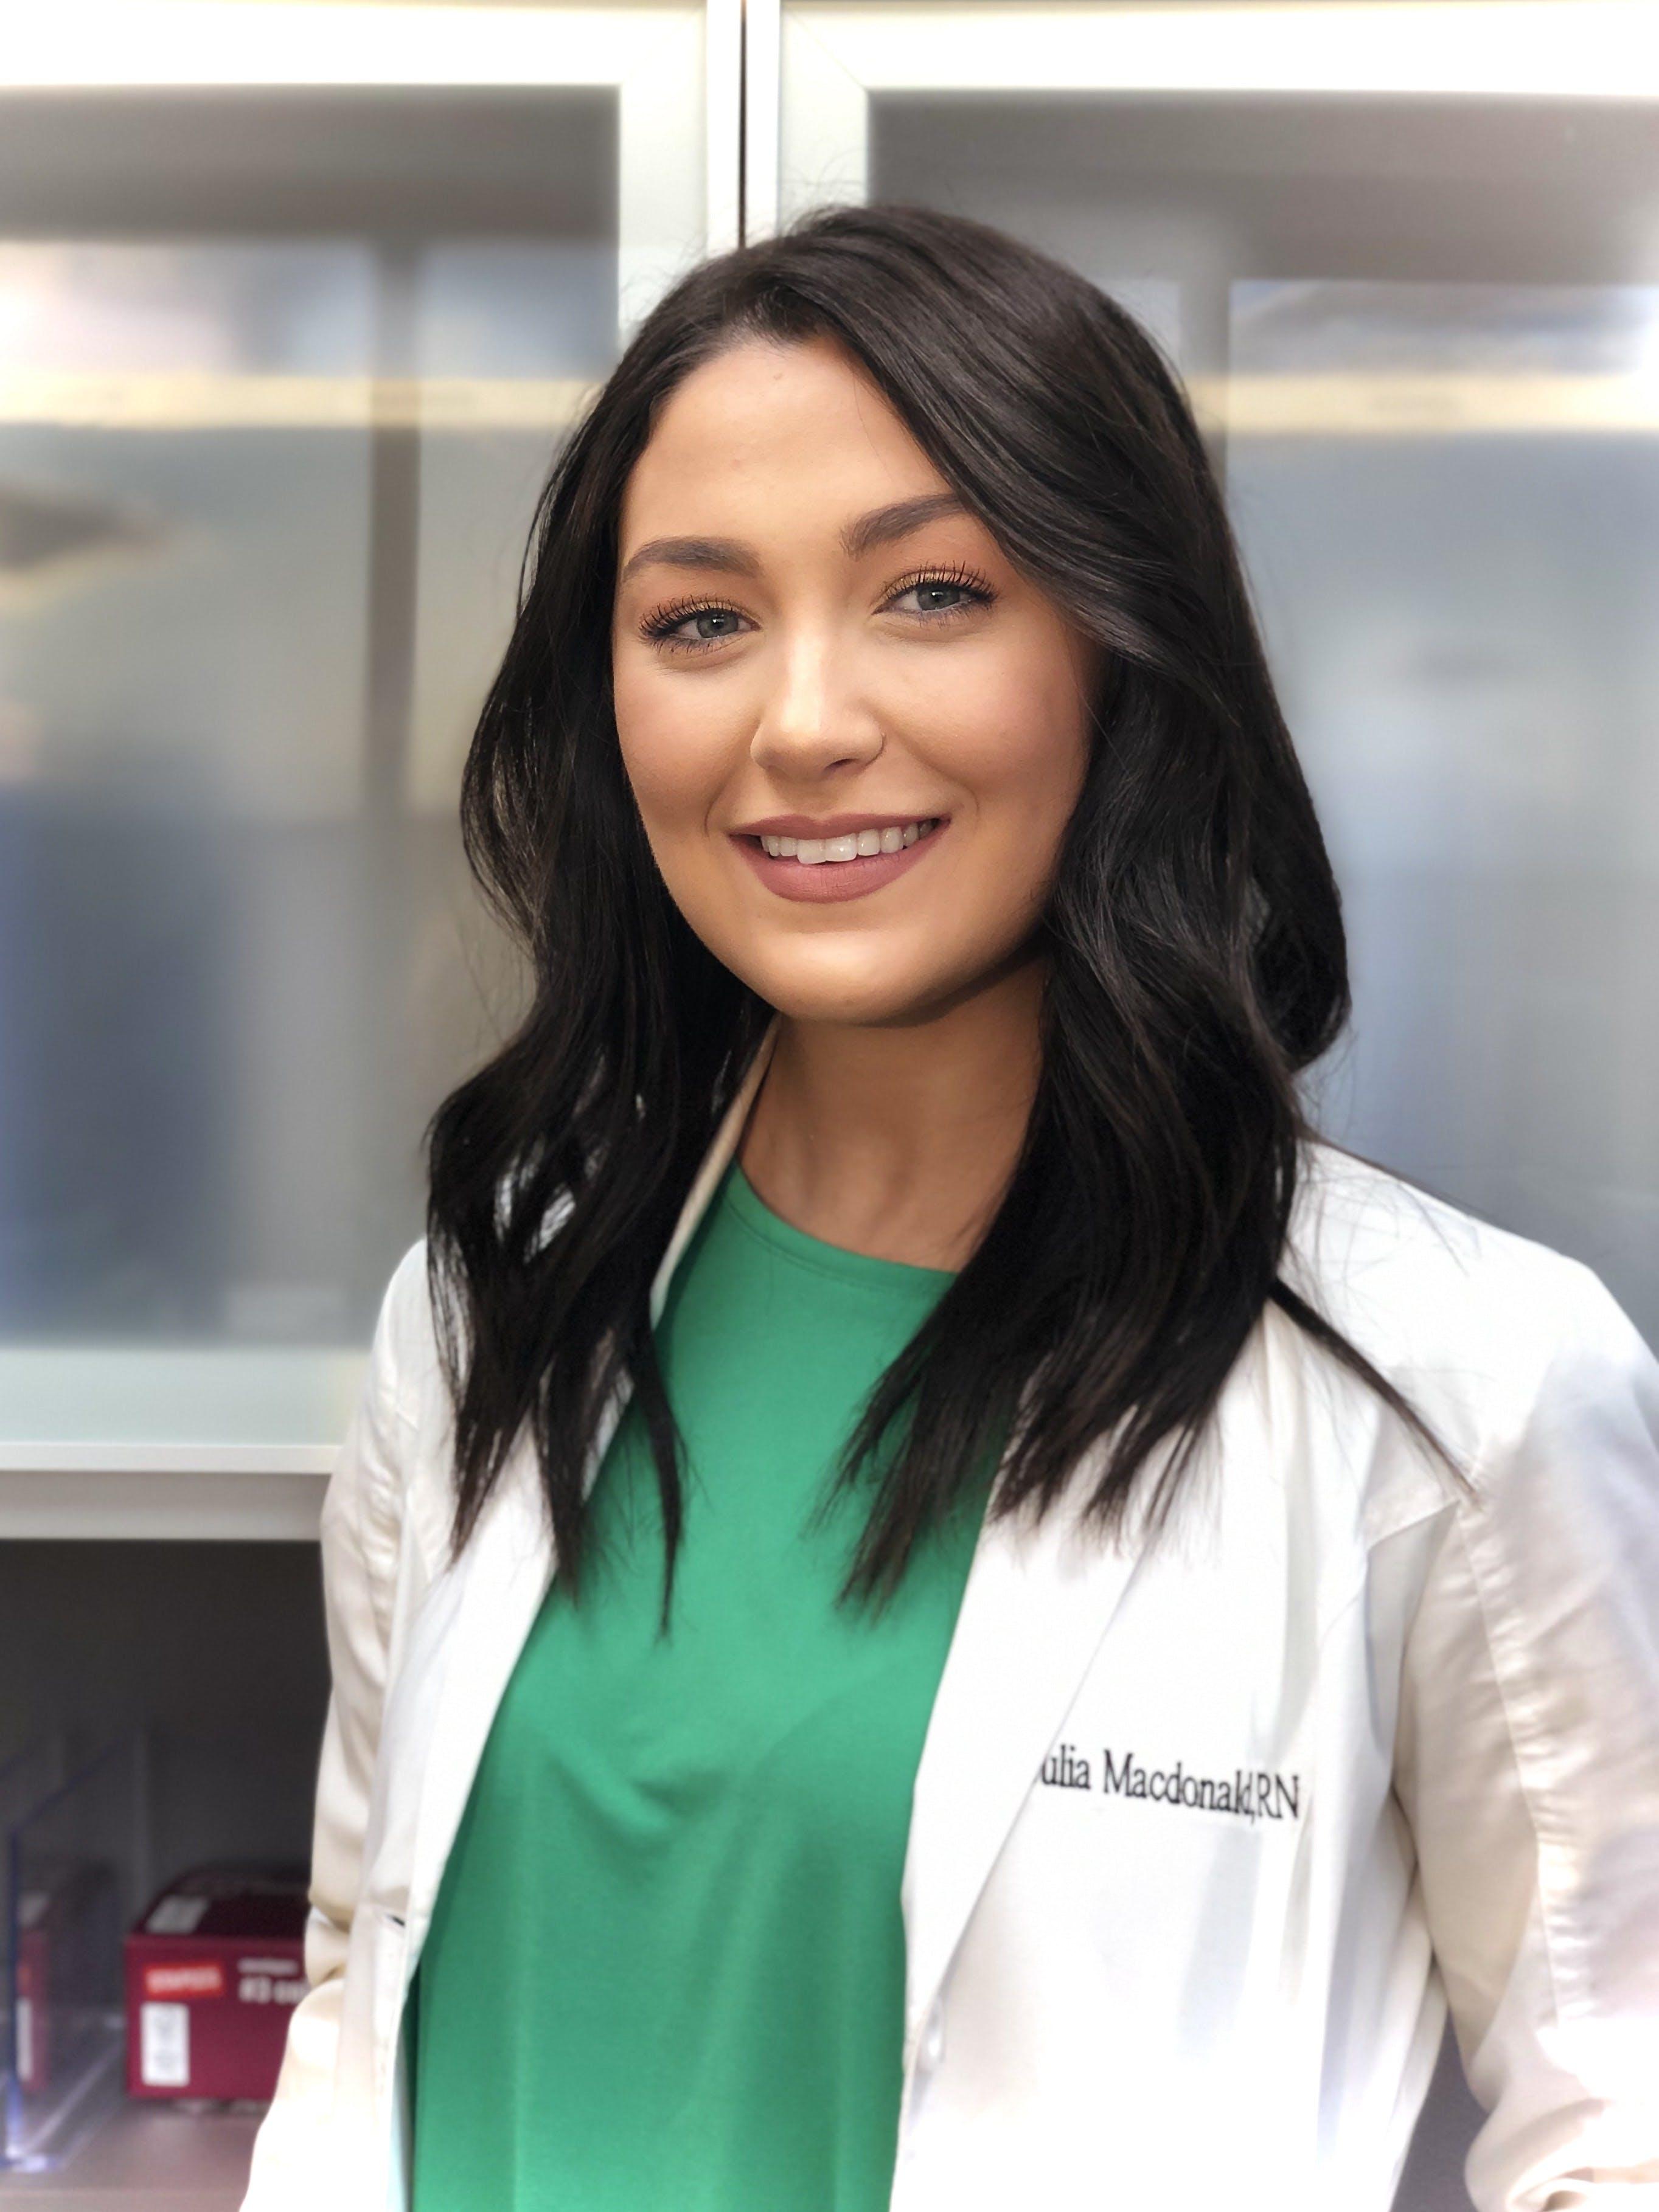 Julia MacDonald, a registered nurse in St. John's, has been accepted into Memorial University's nurse practitioner program in September.